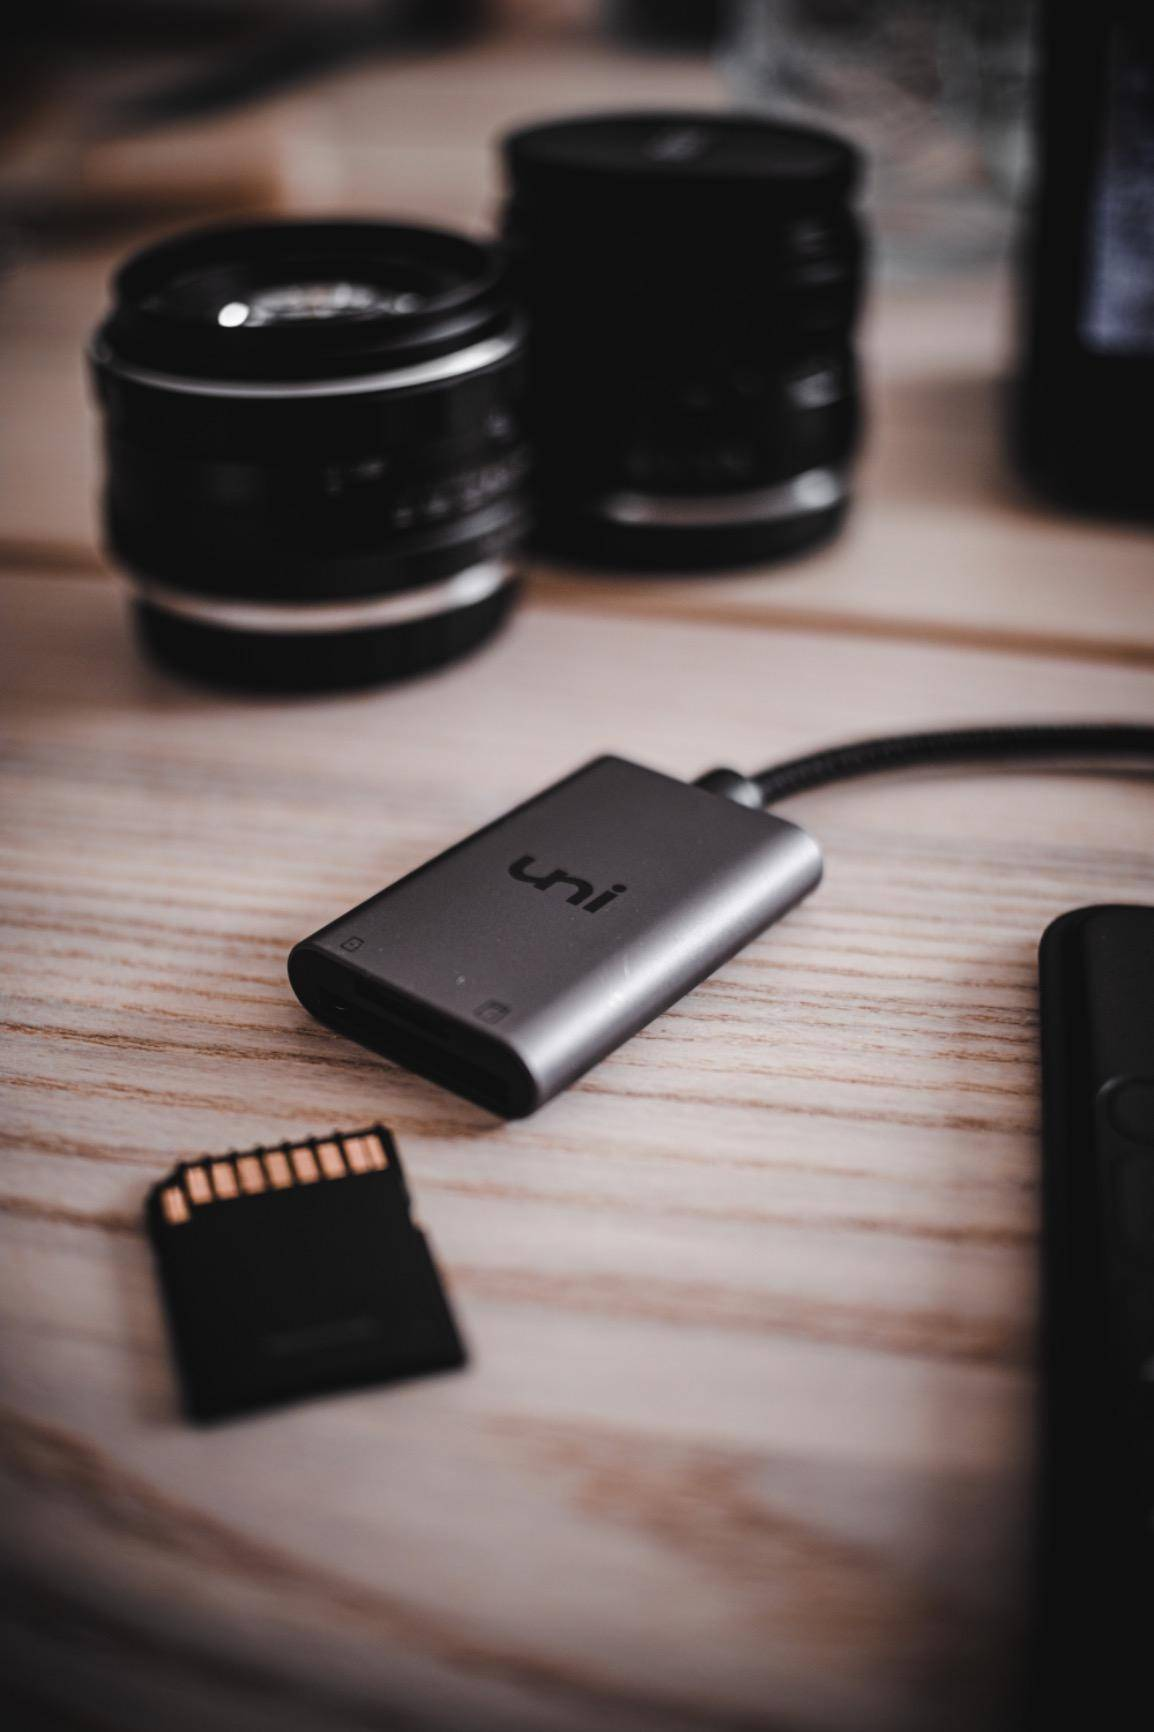 USB-C to SD / MicroSD Card Reader, sd card reader usb-c, micro sd card reader usb-c, usb c to SD card reader, braided nylon cable, card reader